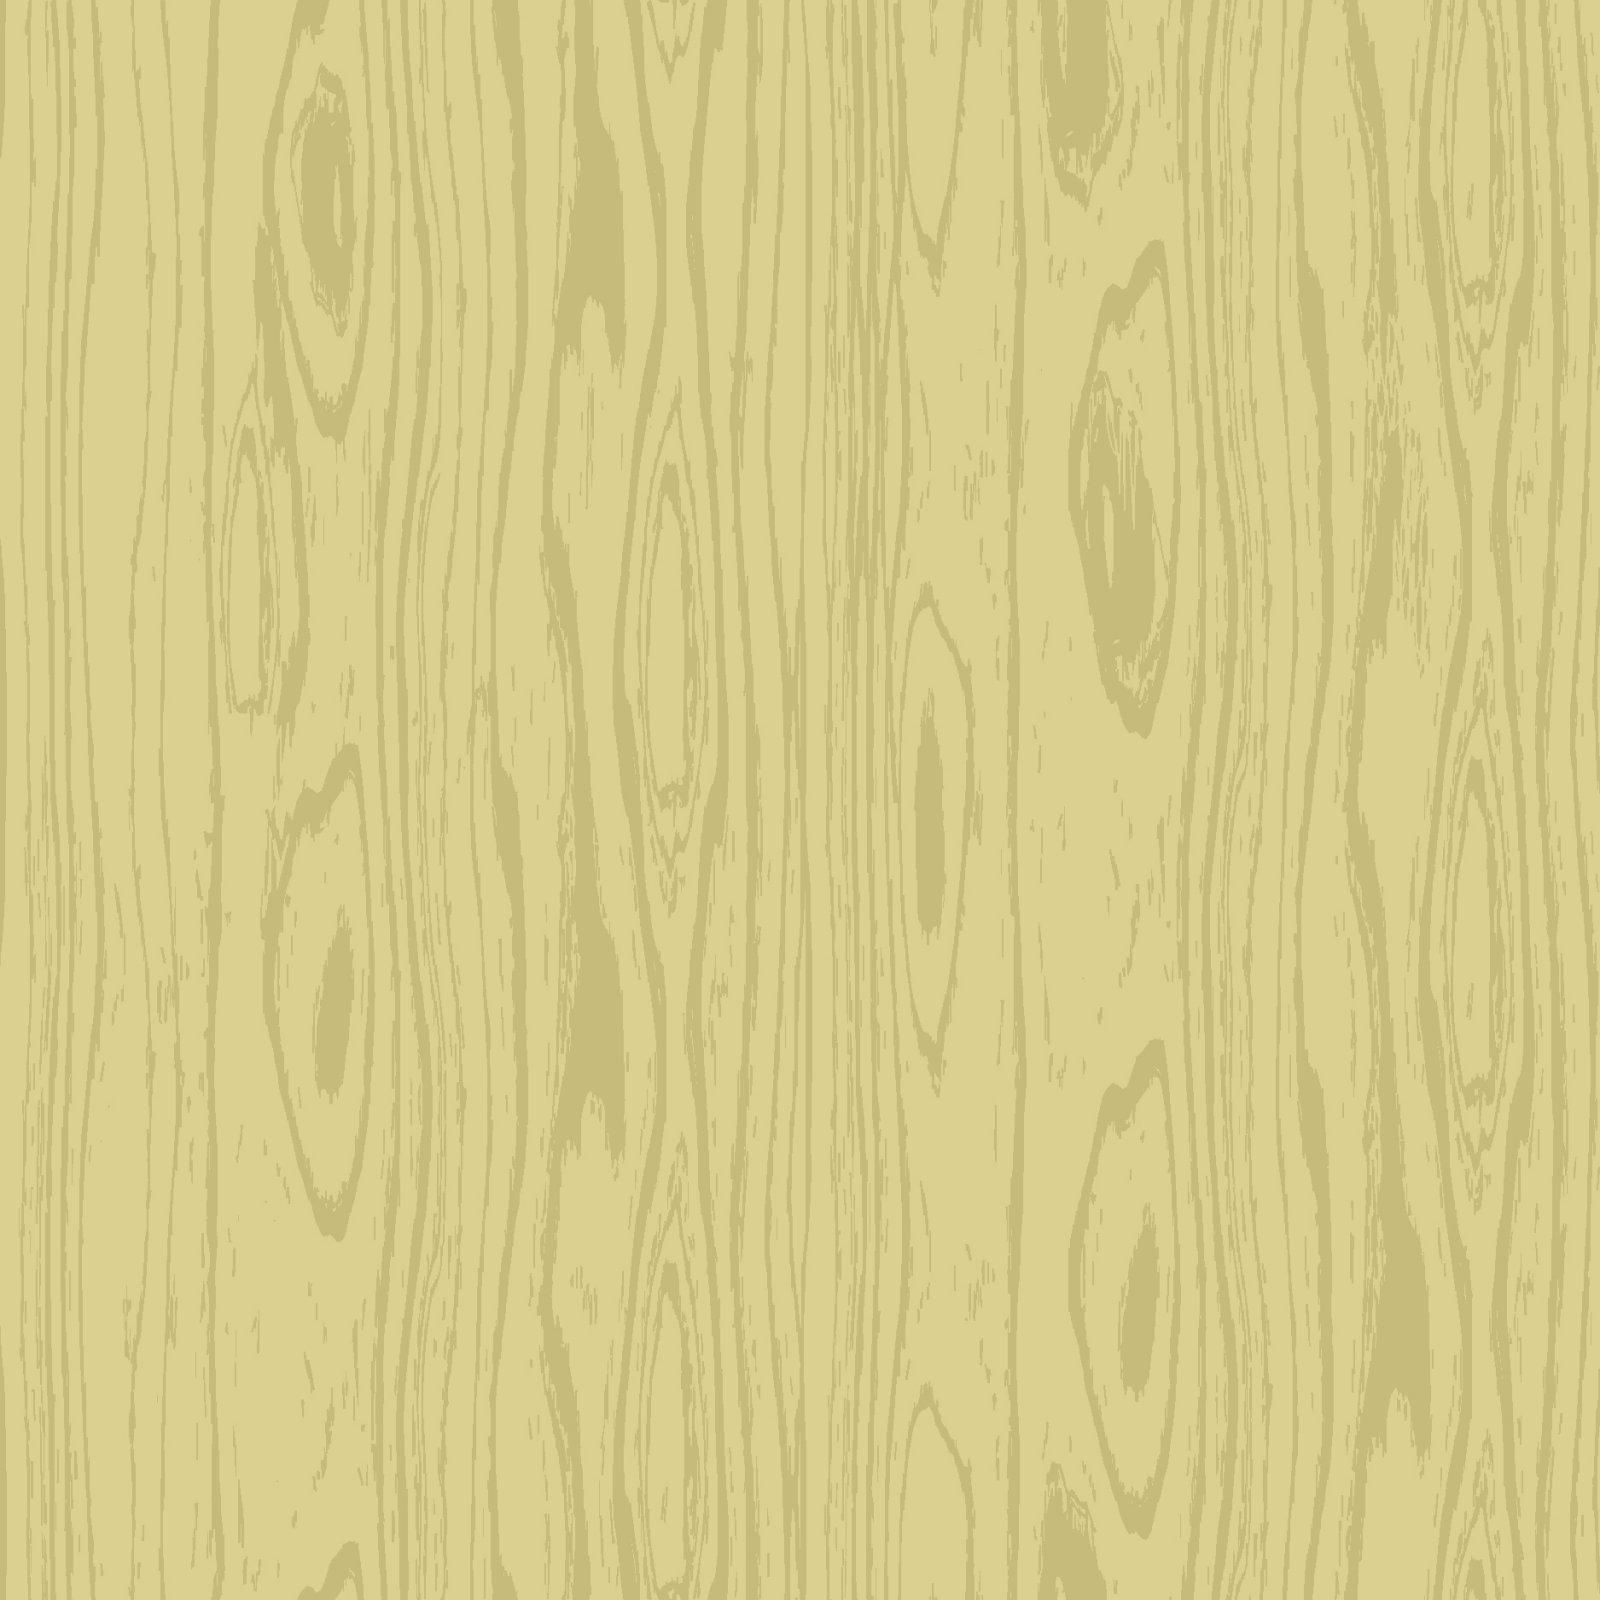 2018 Quilt Minnesota Woodgrain - Gold